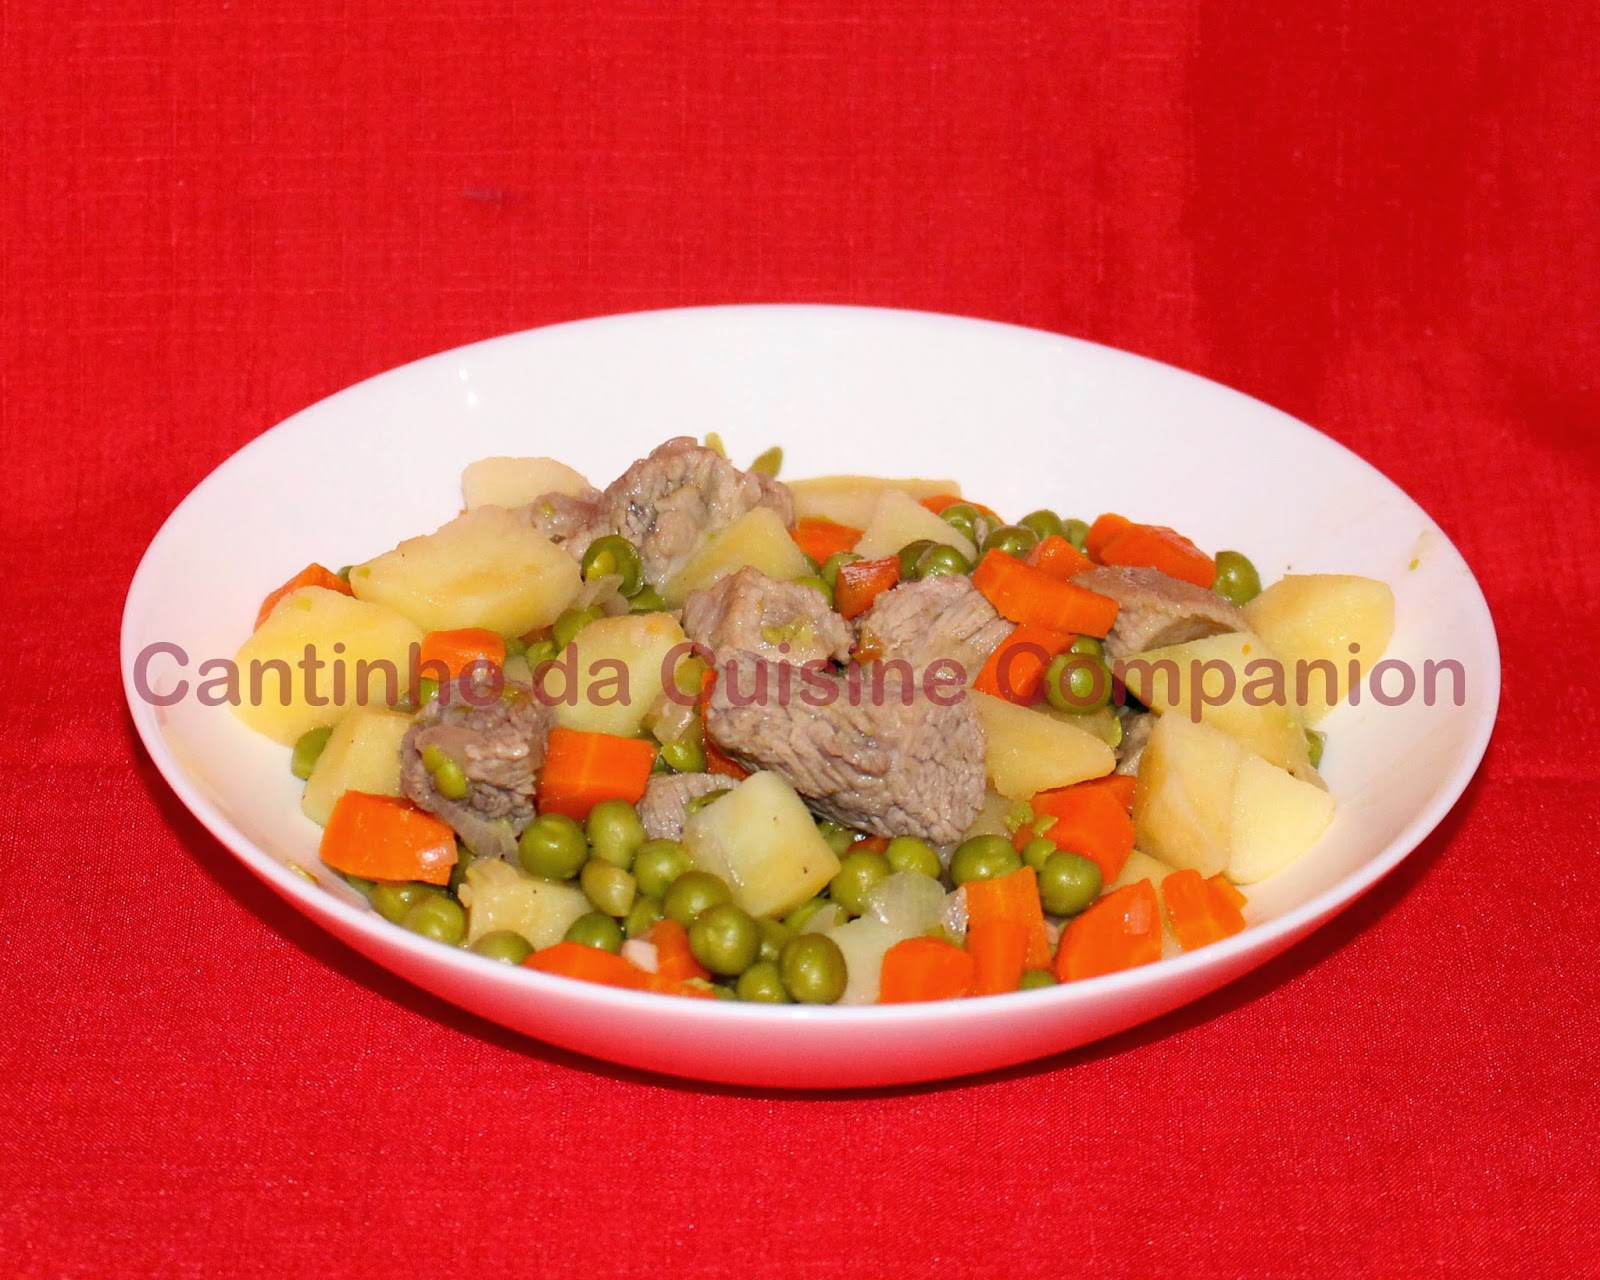 Cantinho da cuisine companion jardineira for Cuisine companion